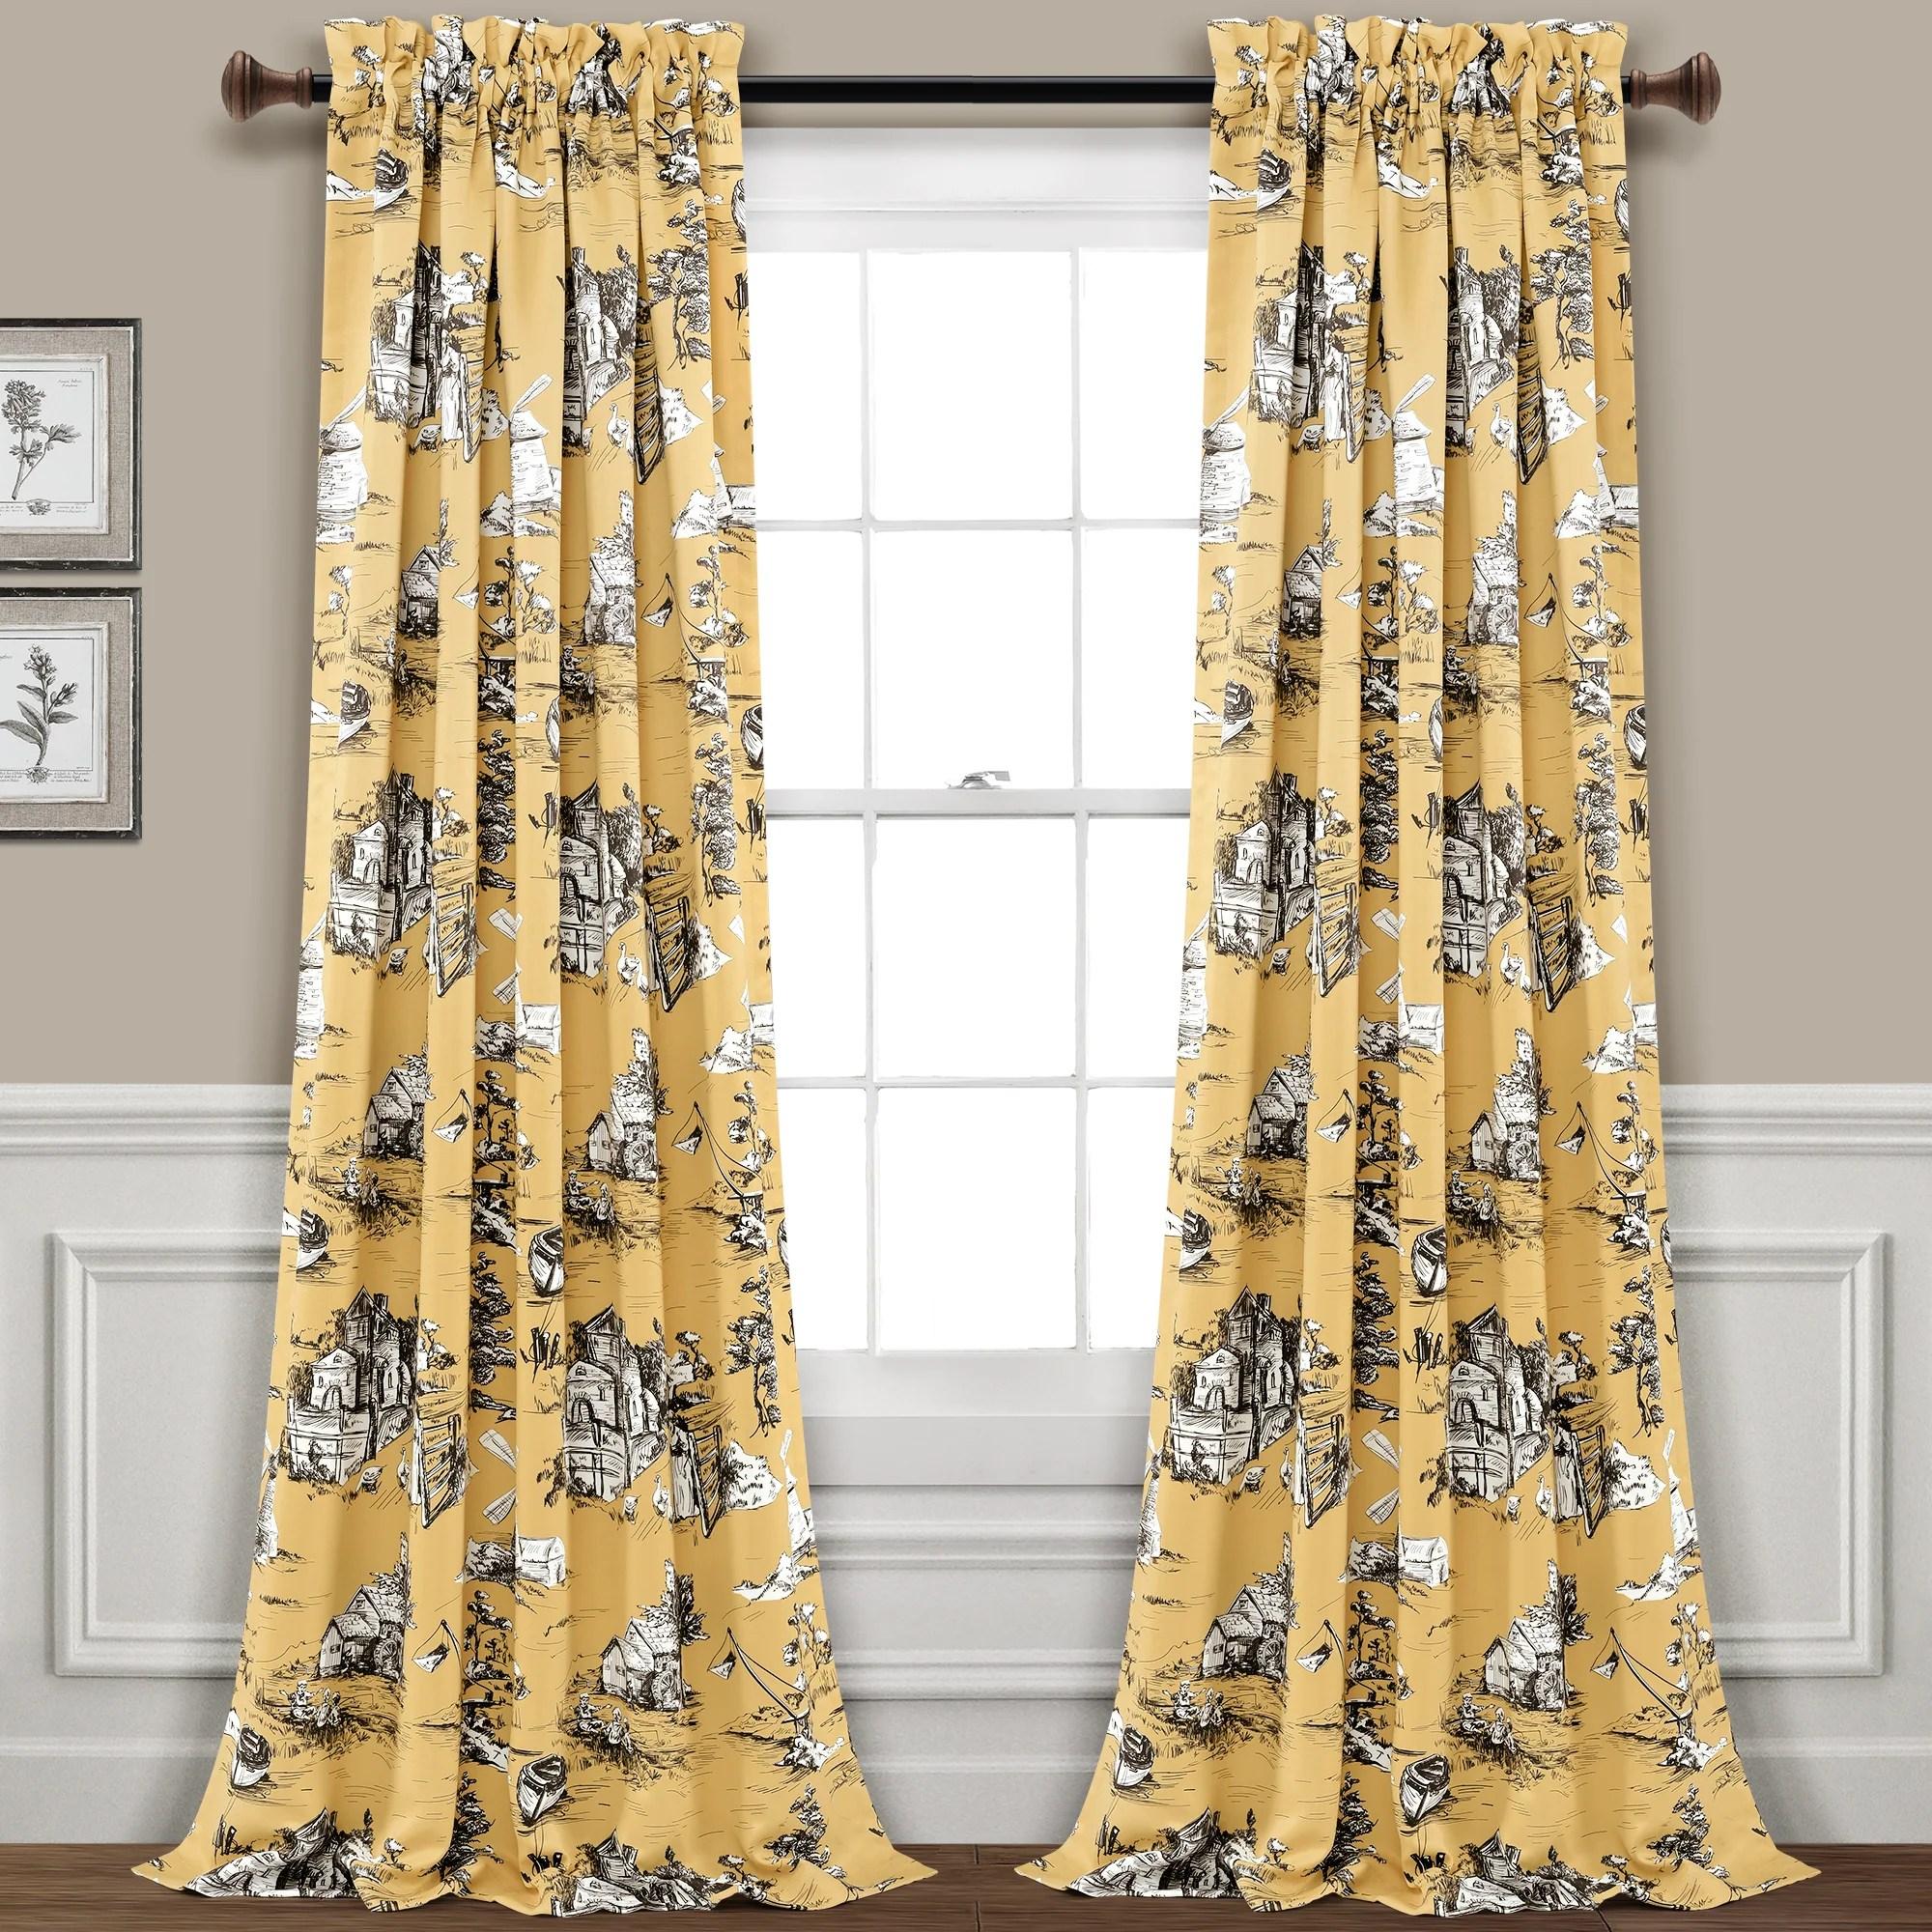 french country toile room darkening window curtain set 84 x 52 2 header yellow gray